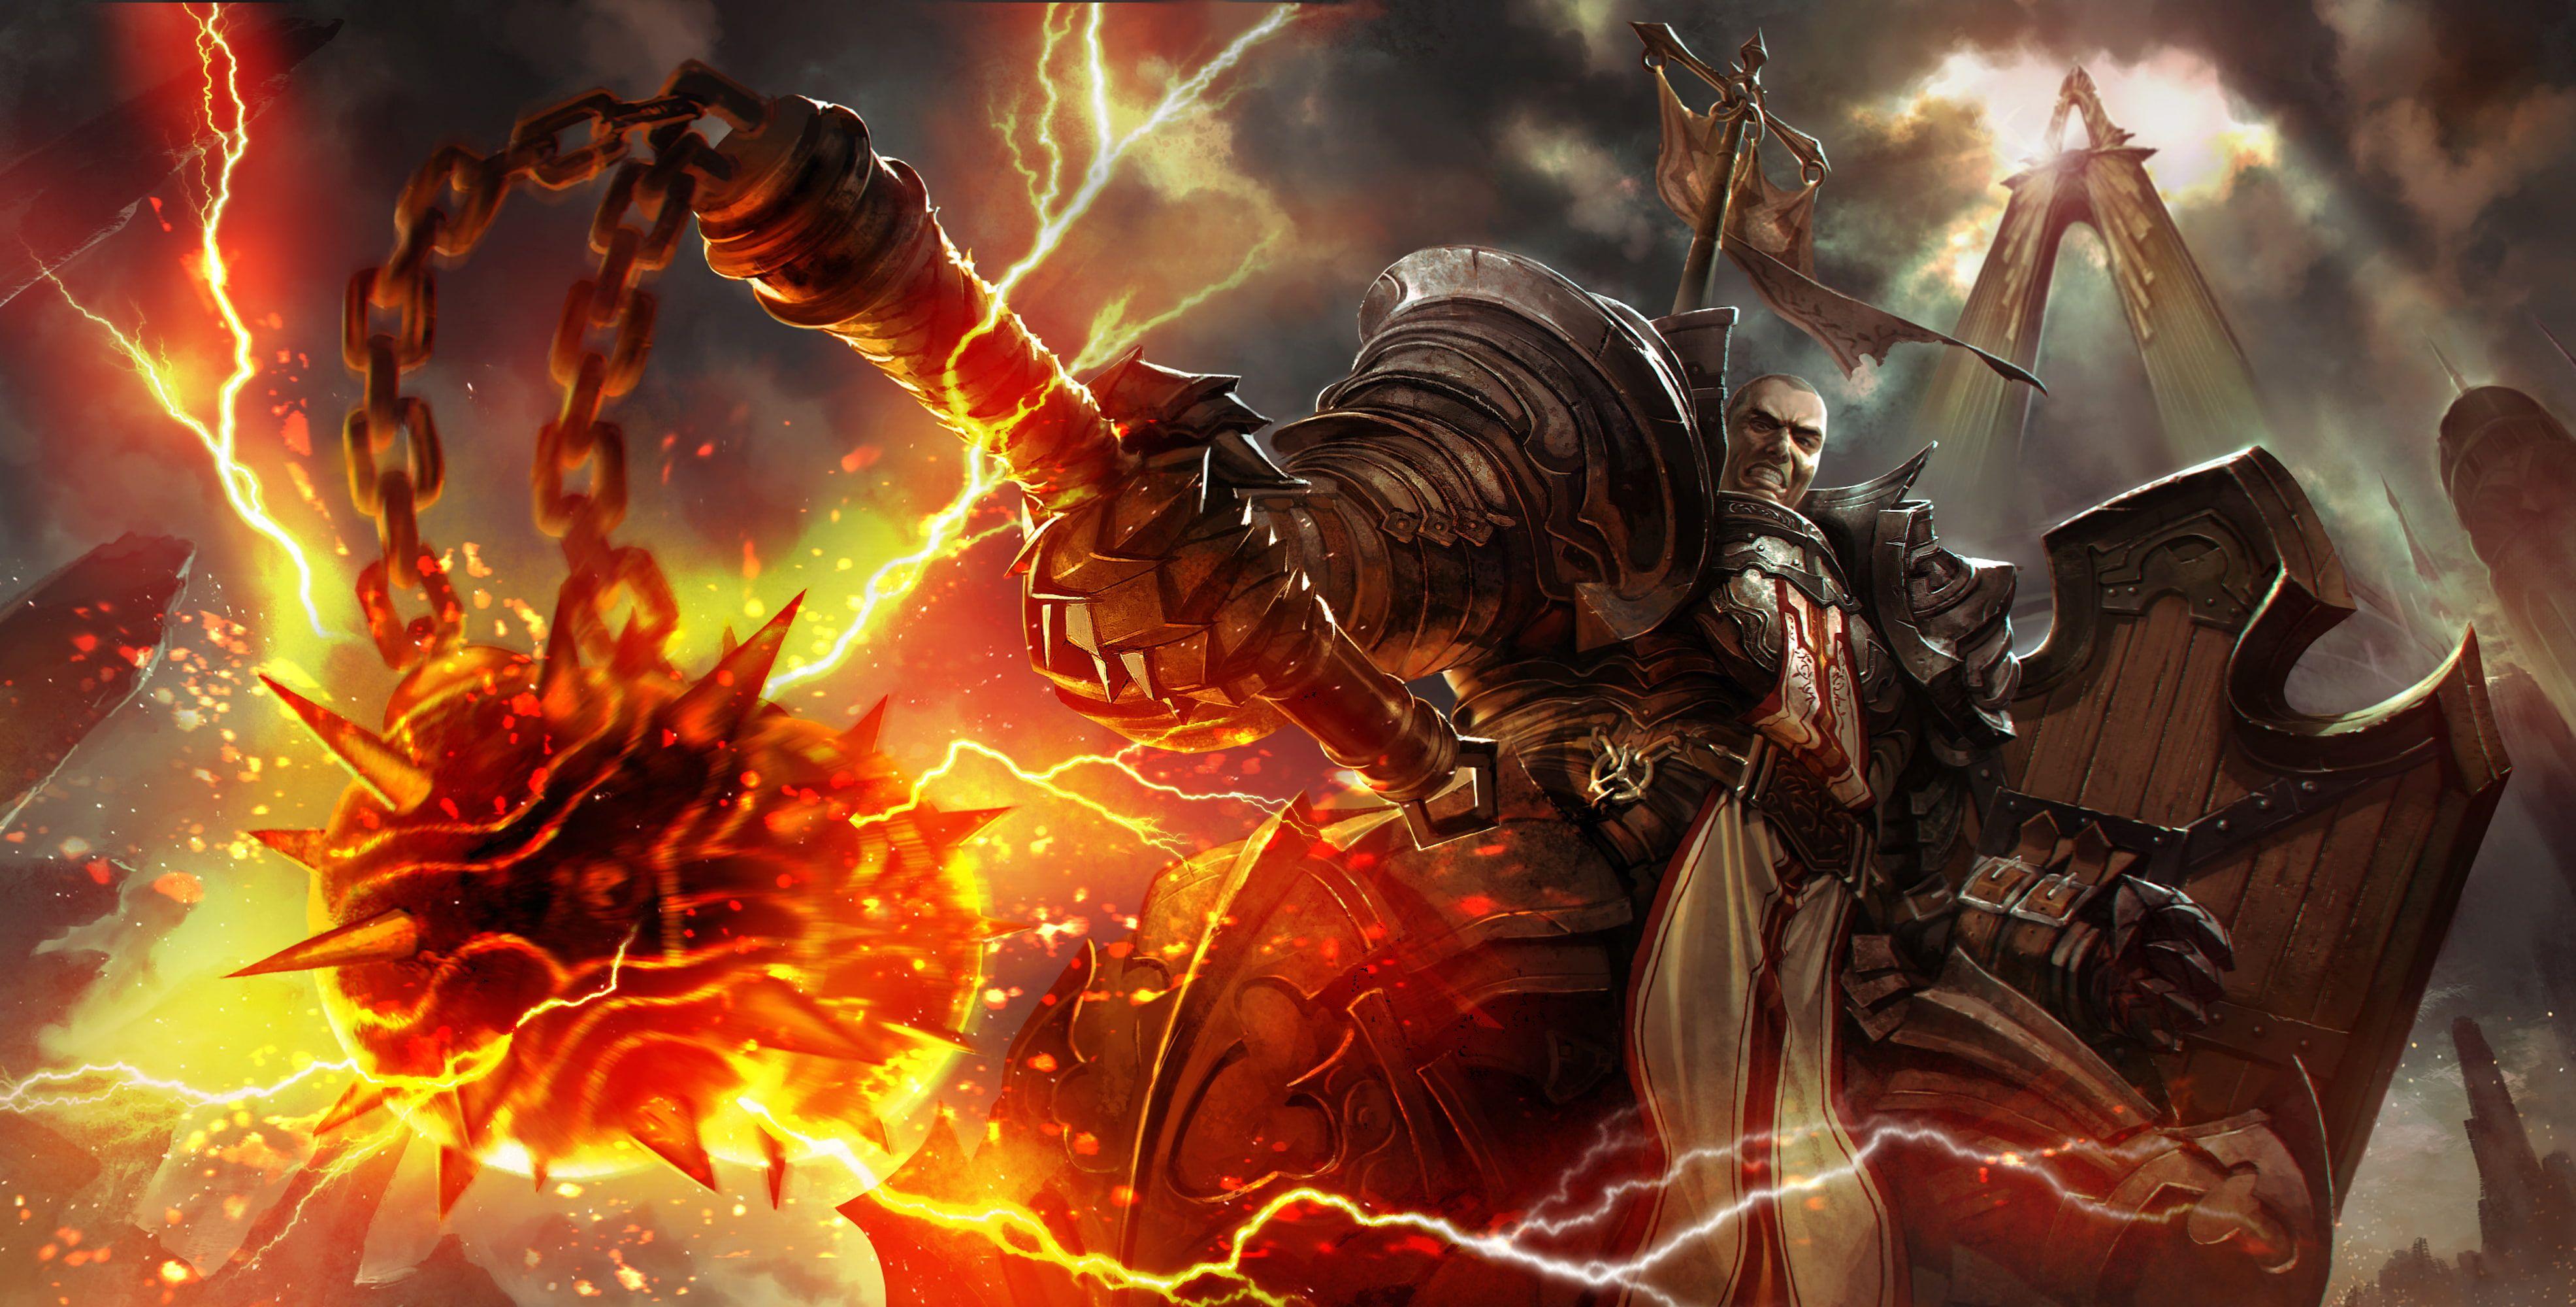 Fire Diablo 3 Crusader Reaper Of Souls Diablo 3 Reaper Of Souls Morgenstern 4k Wallpaper Hdwallpaper Des Paladin Art Deviant Art Fantasy Soul Wallpaper